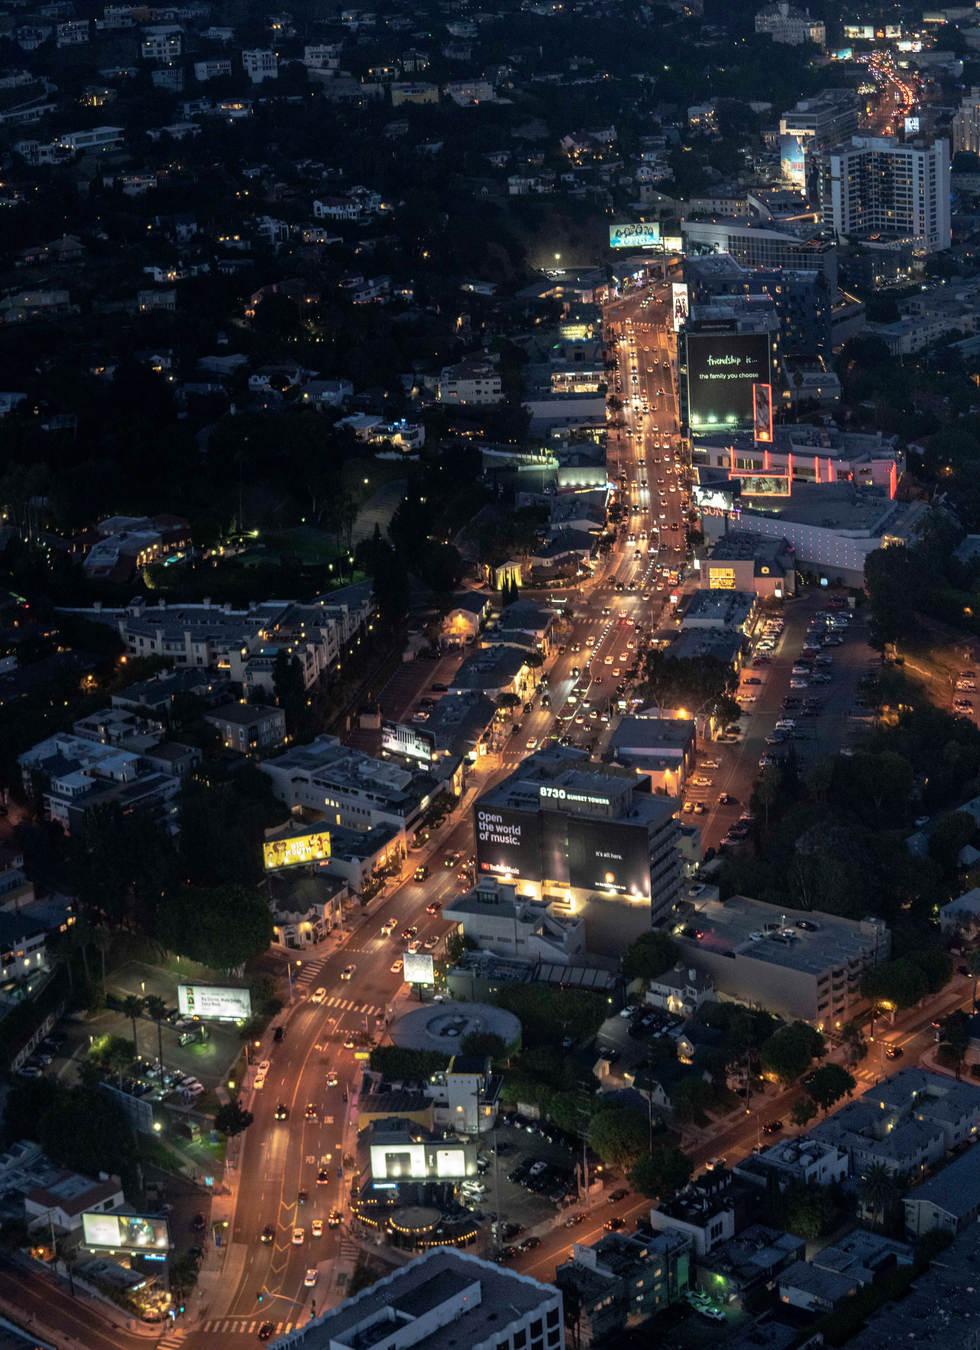 'Whiskey a Go-Go', Sunset Blvd, Los Angeles